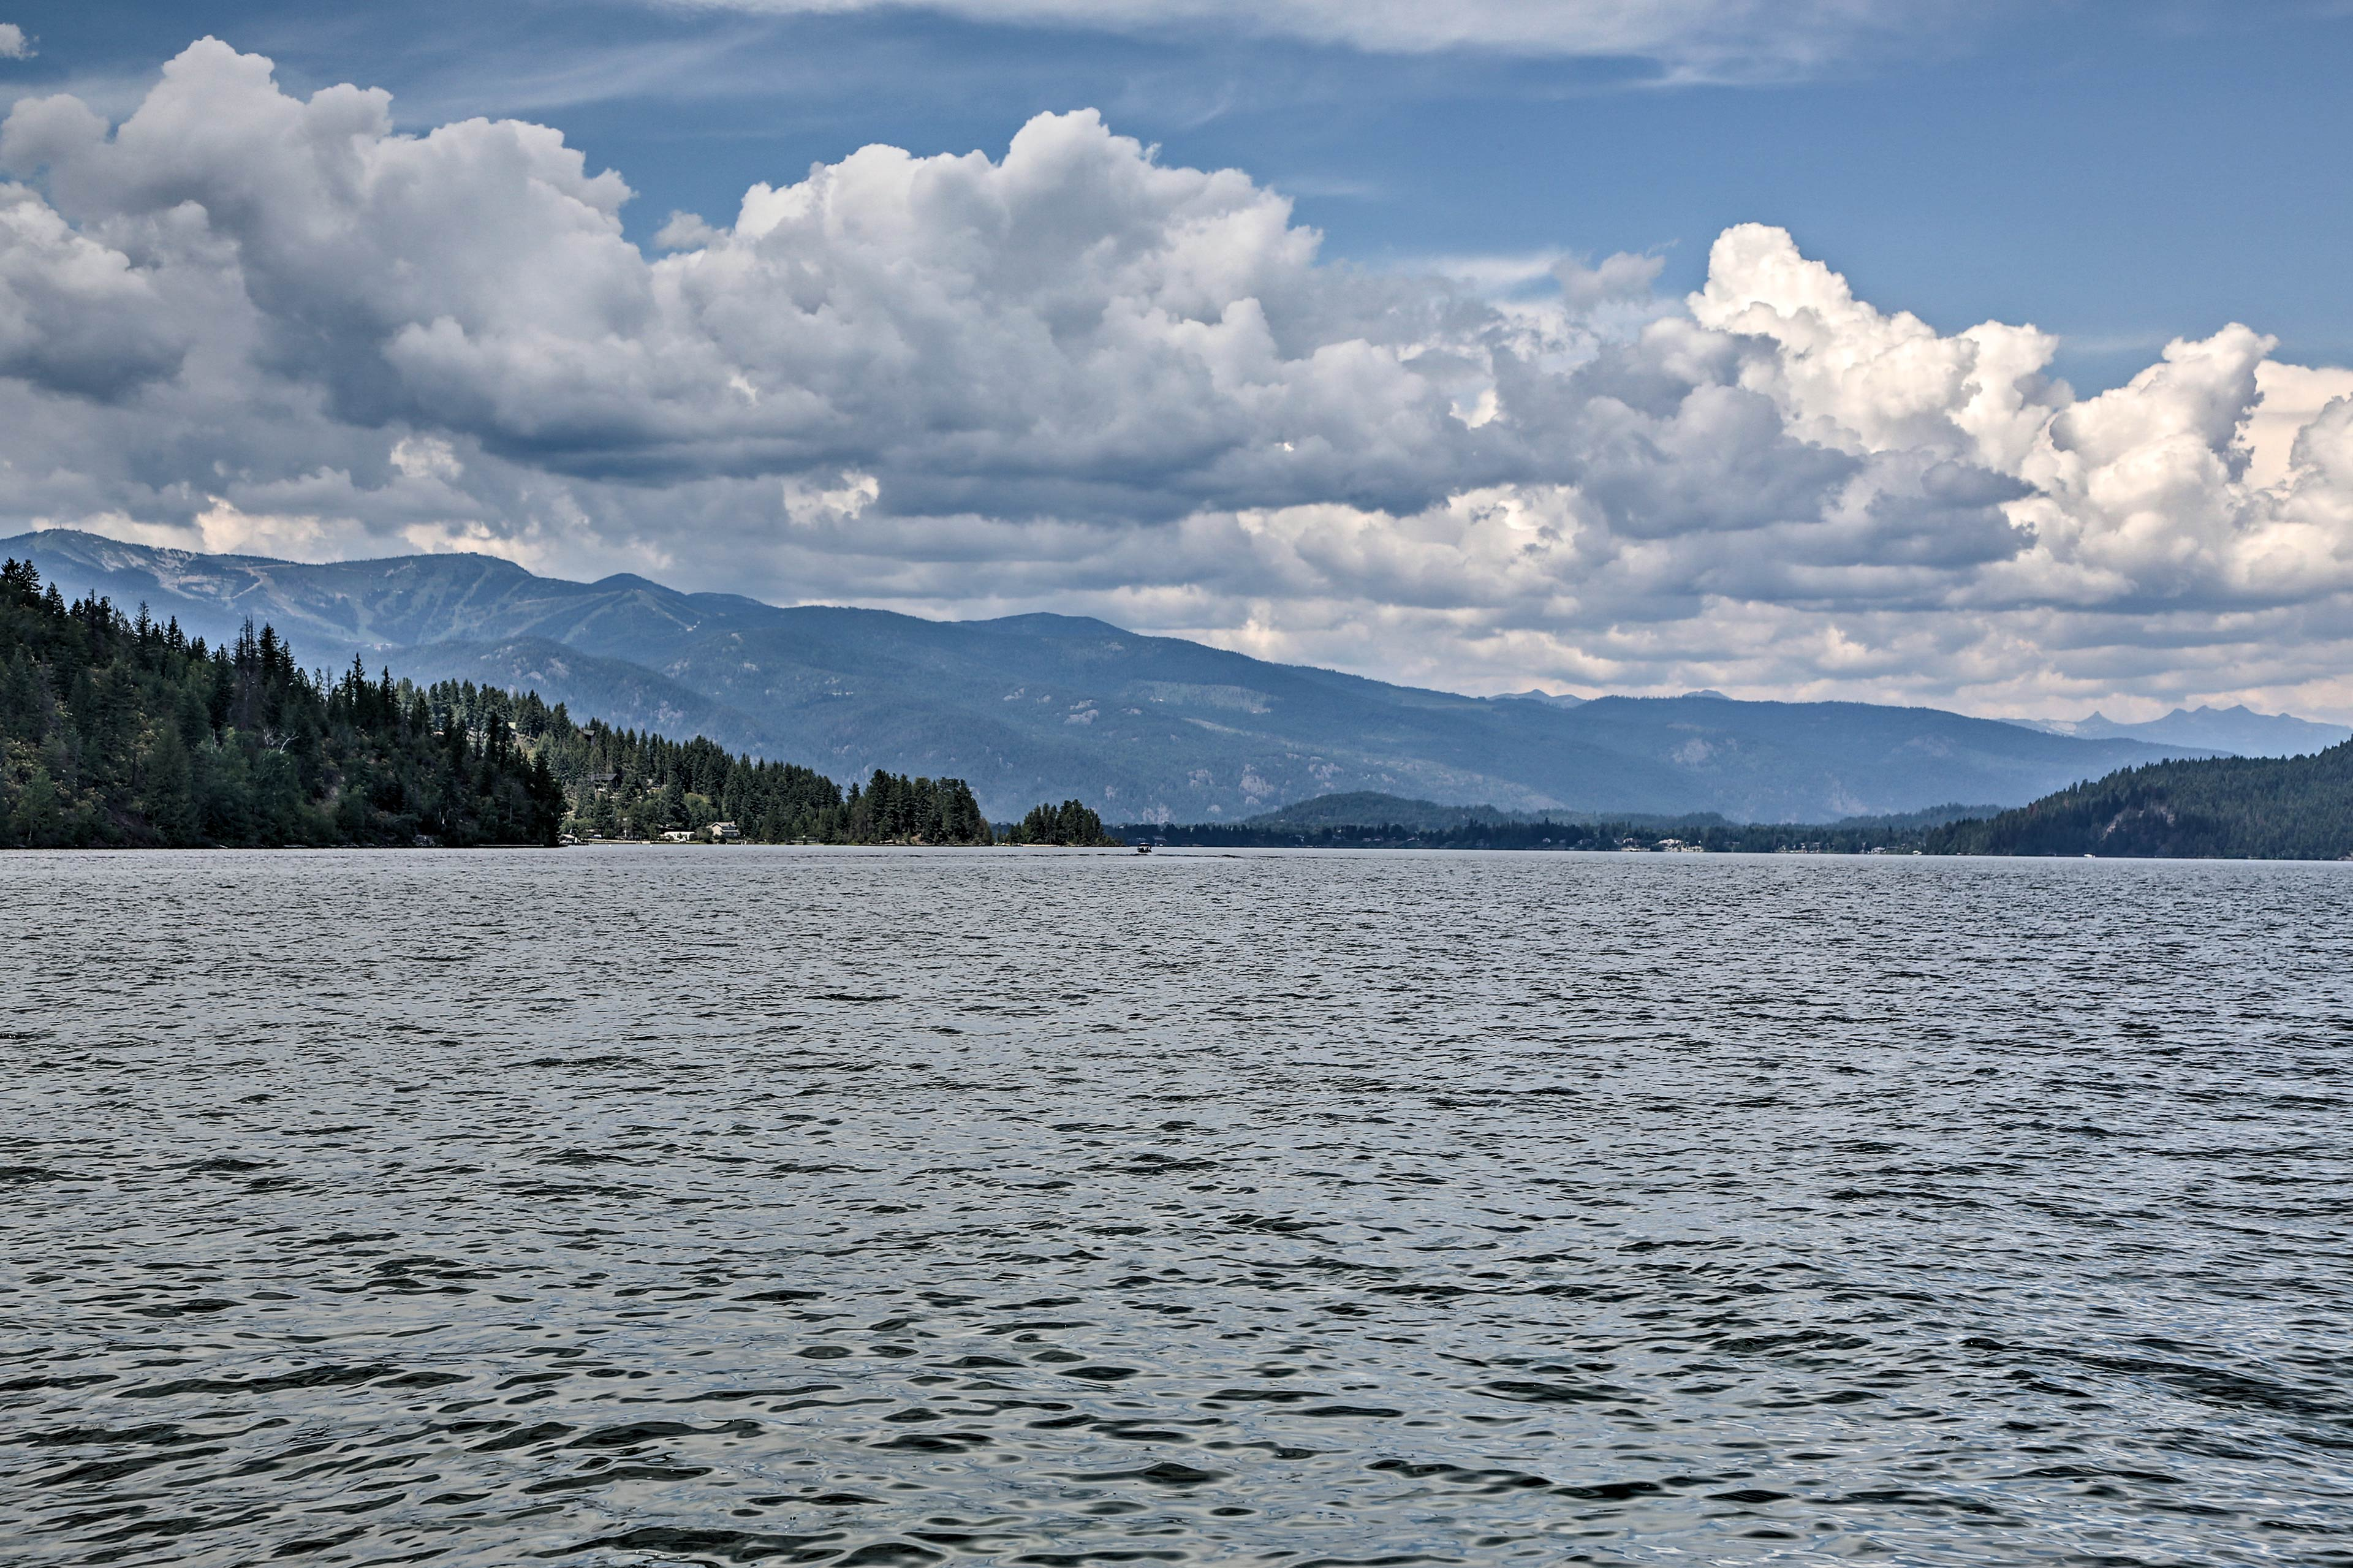 Lake Pend Oreille calls you to get away.